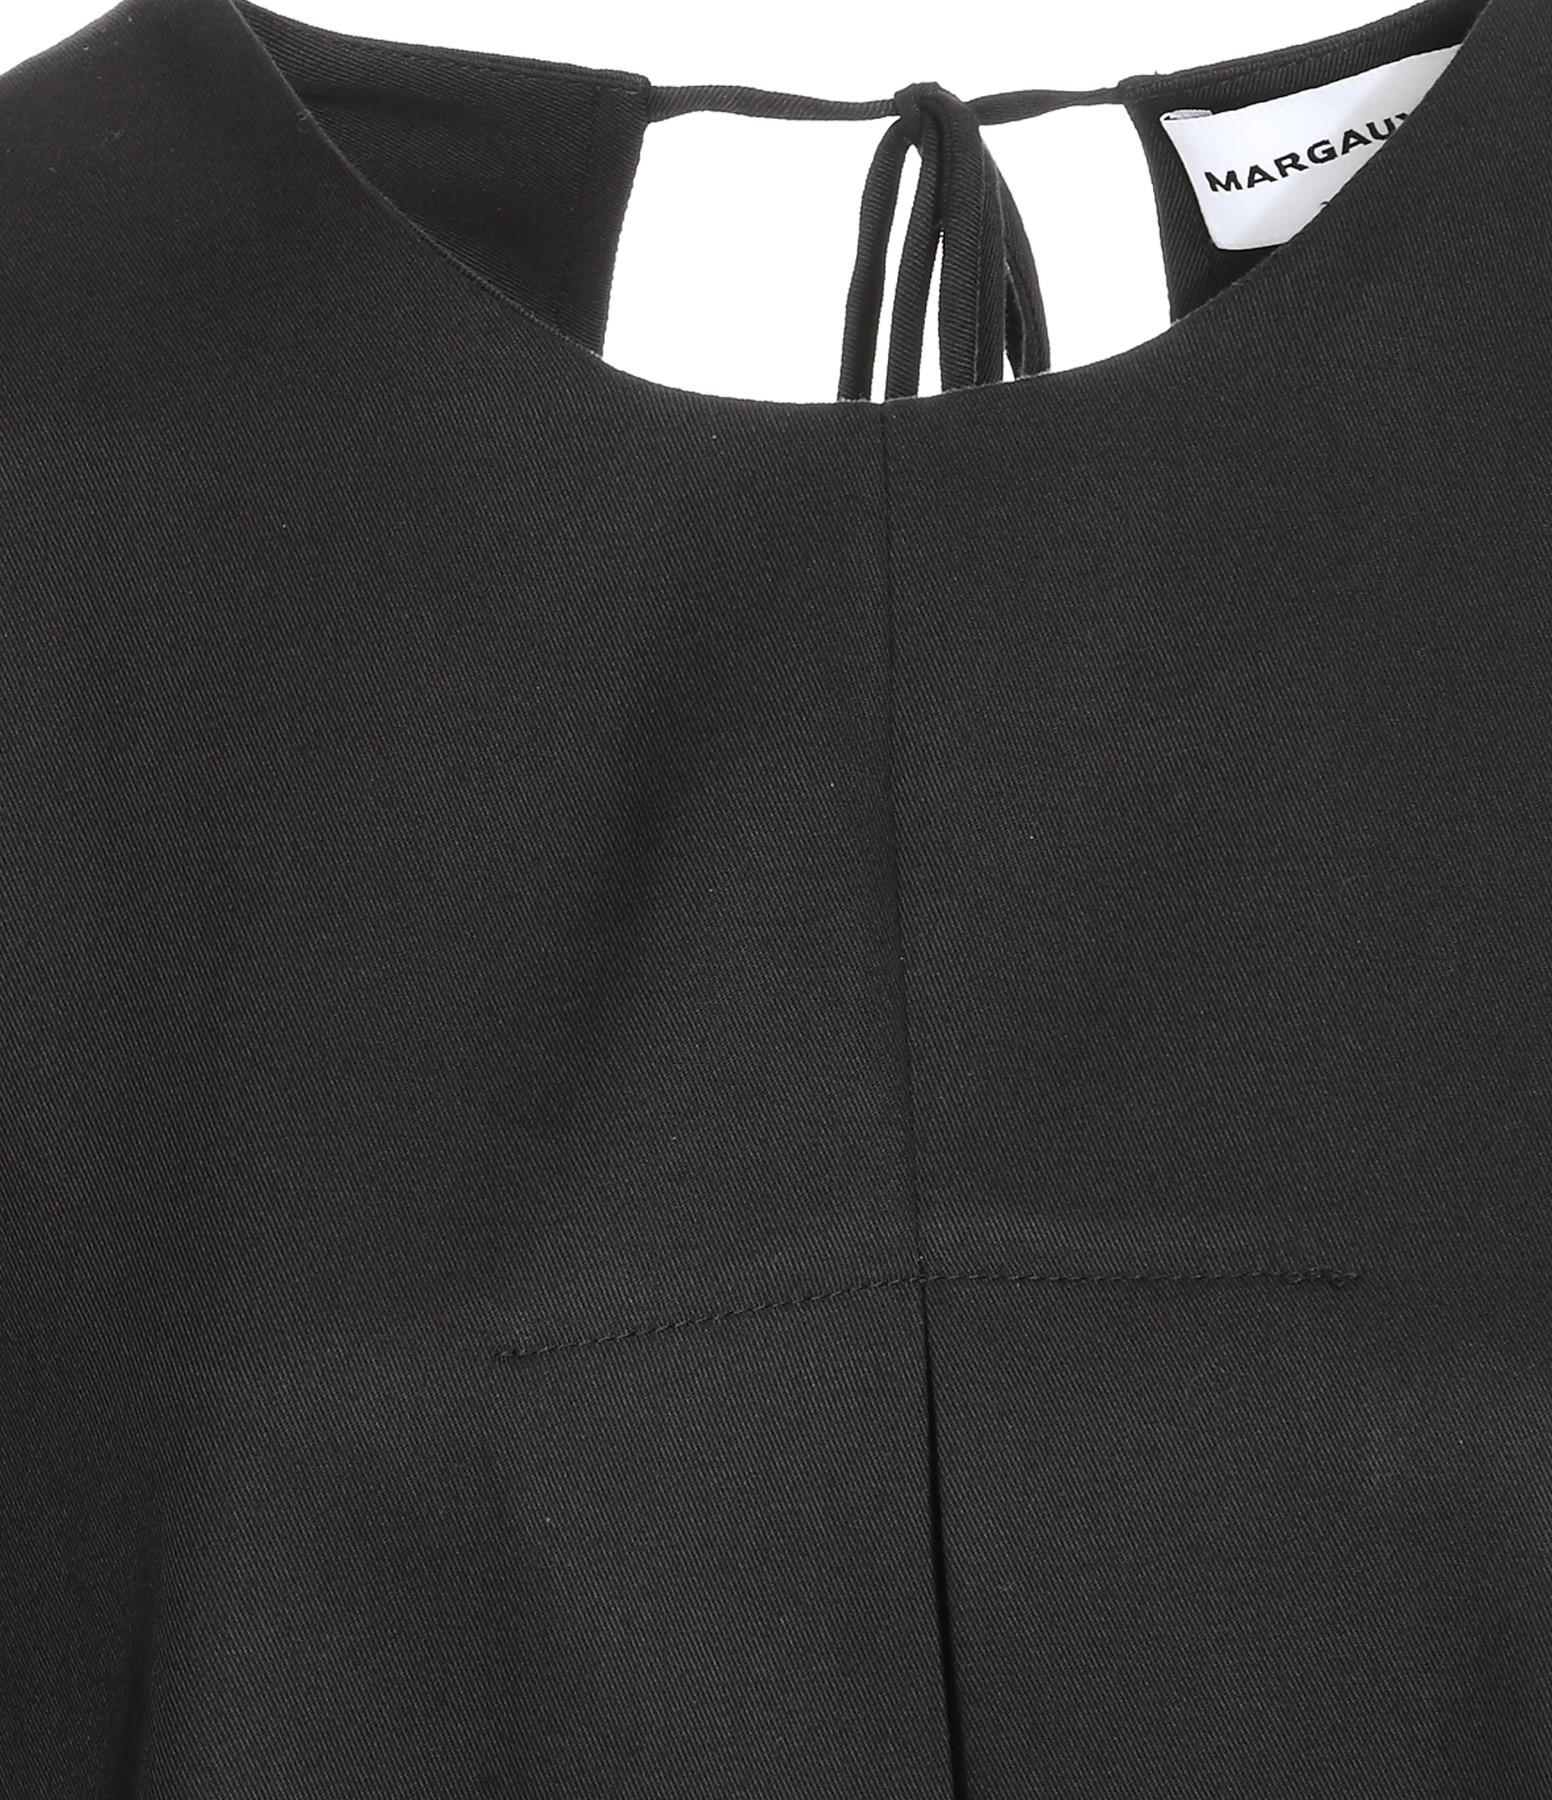 MARGAUX LONNBERG - Robe Valentina Noir